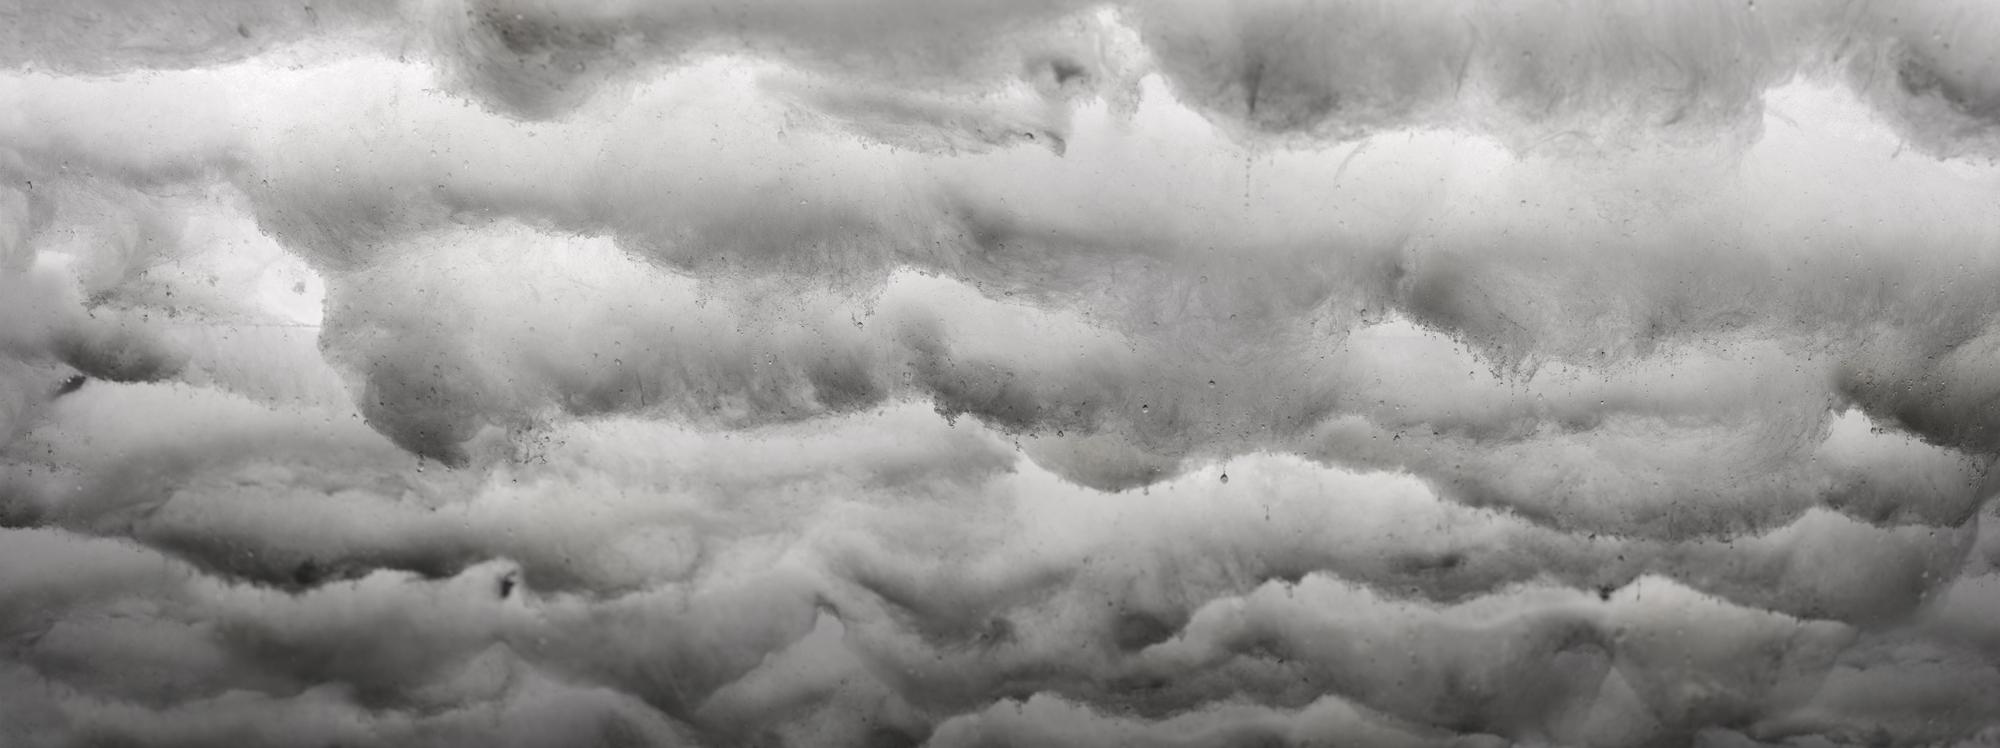 DAVID LAWRY & JAKI MIDDLETON  Downfall #1  2016 c-type metallic print edition of 5 + 1 AP 126 × 48 cm